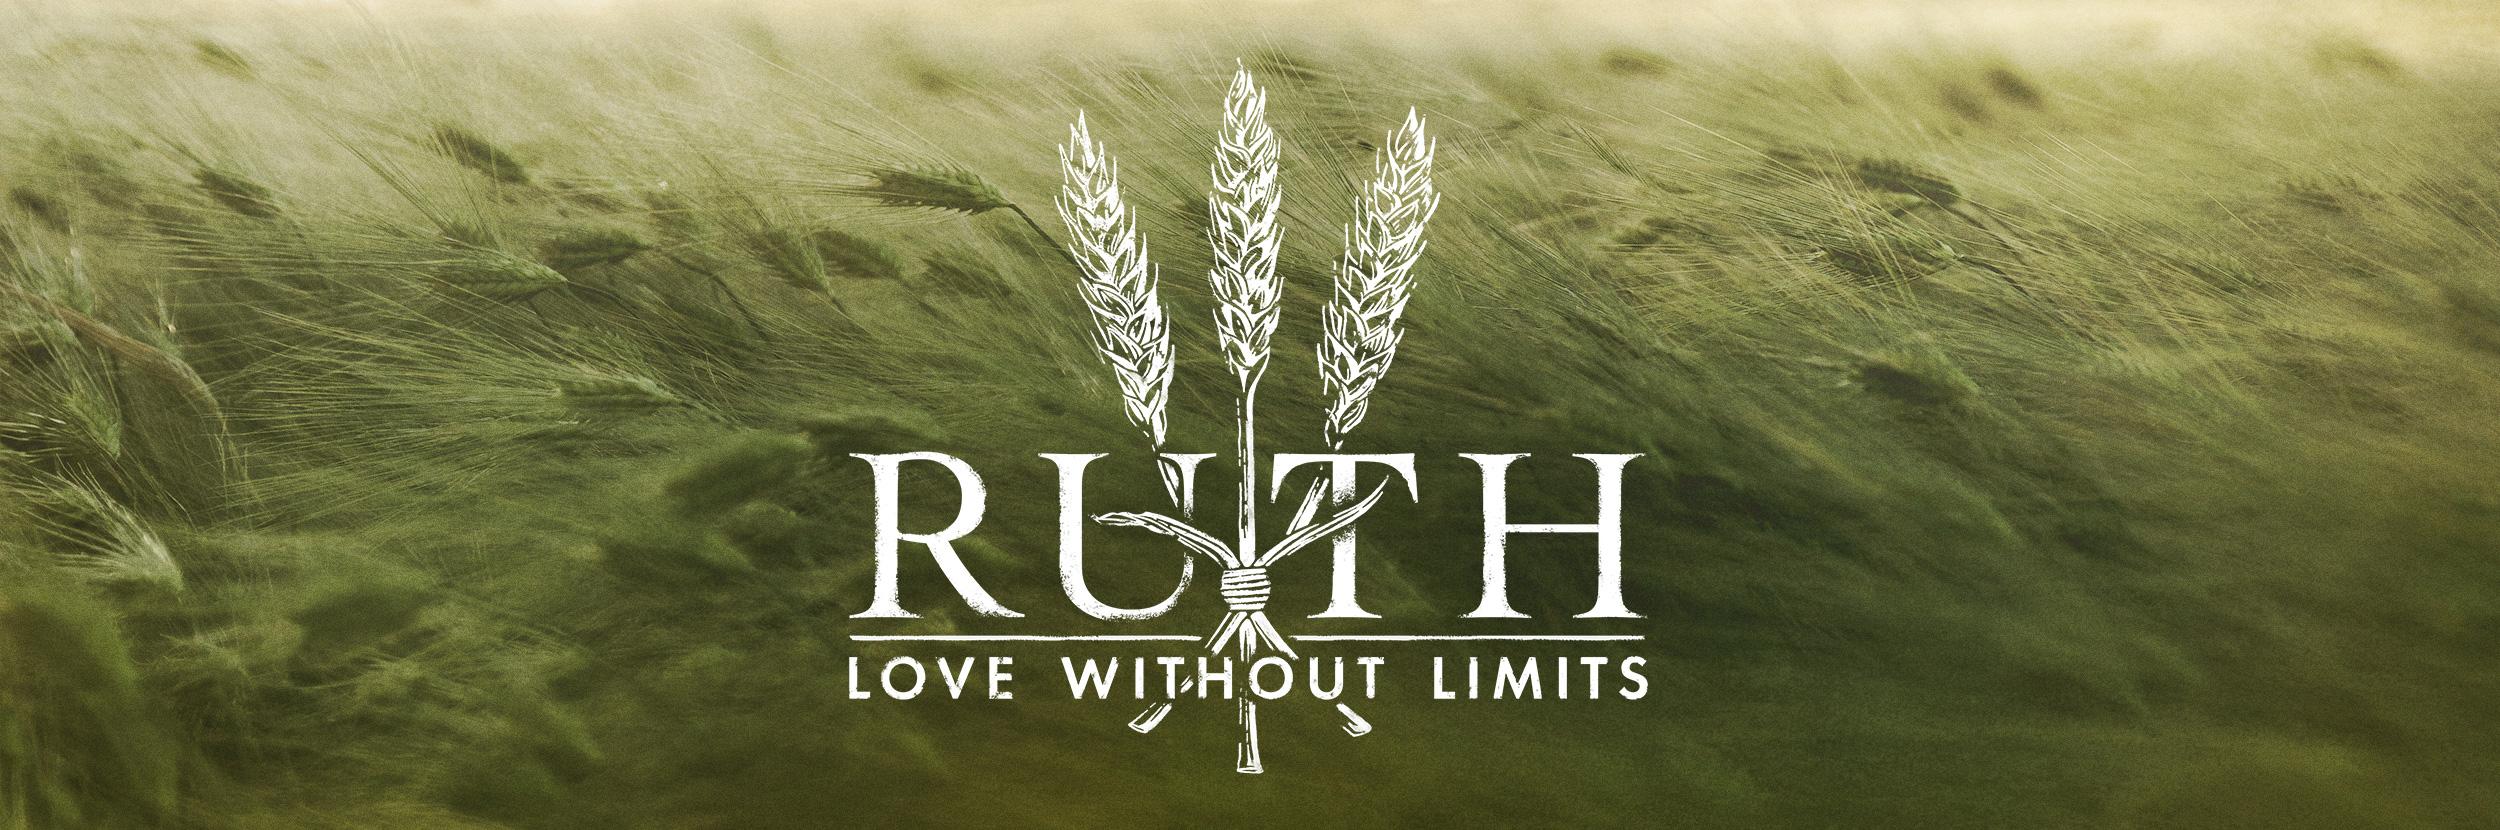 ruth-act2-banner-2500x830.jpg